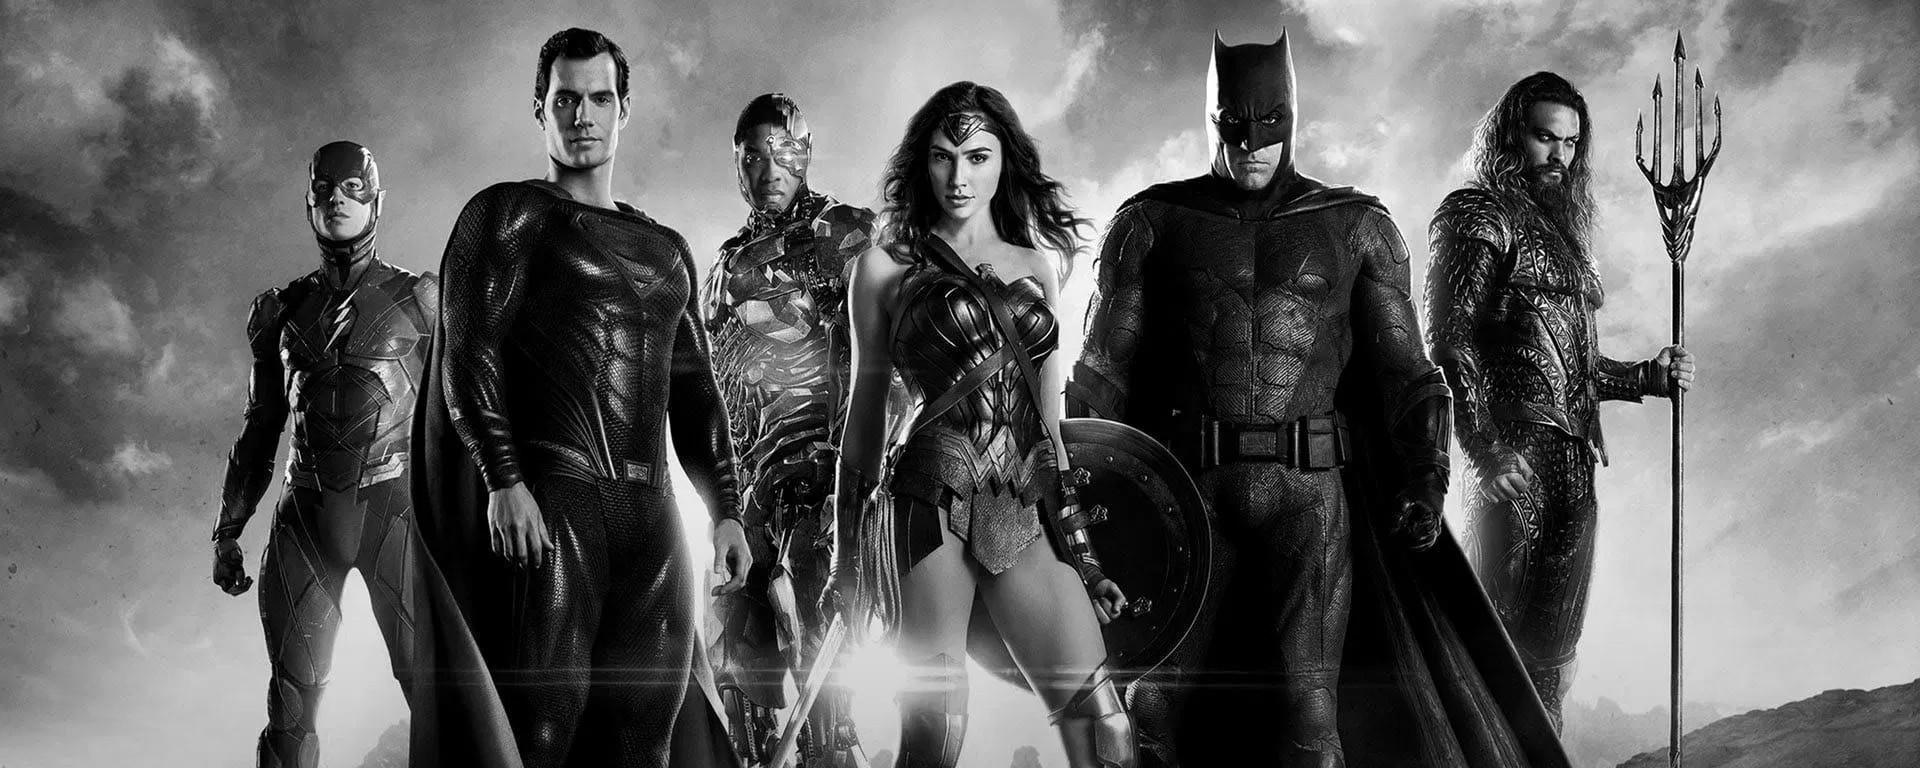 Zack Snyder's Justice League Header